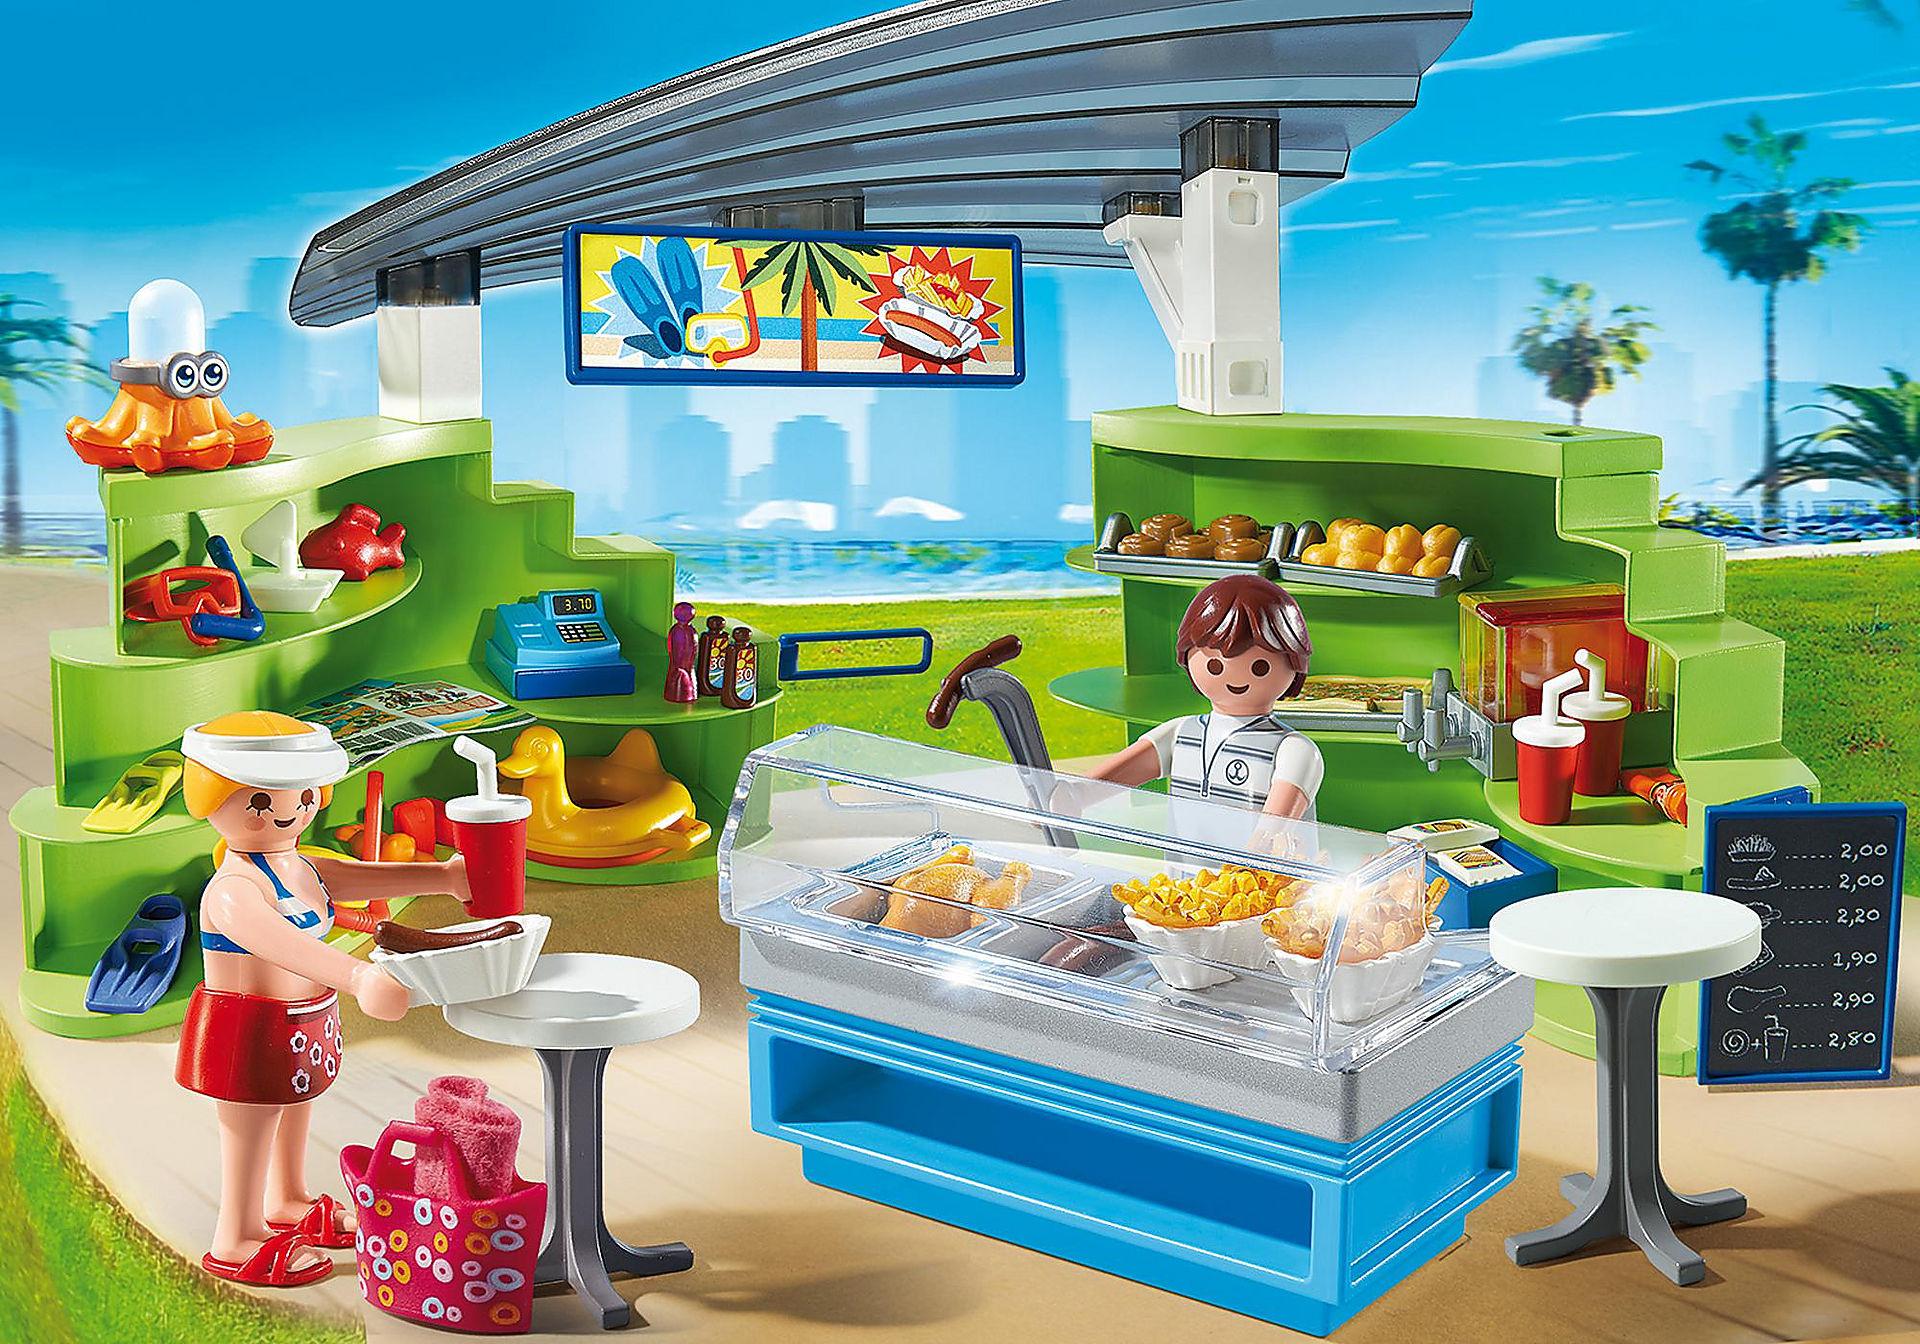 http://media.playmobil.com/i/playmobil/6672_product_detail/Kαντίνα με σνακ και είδη θαλάσσης